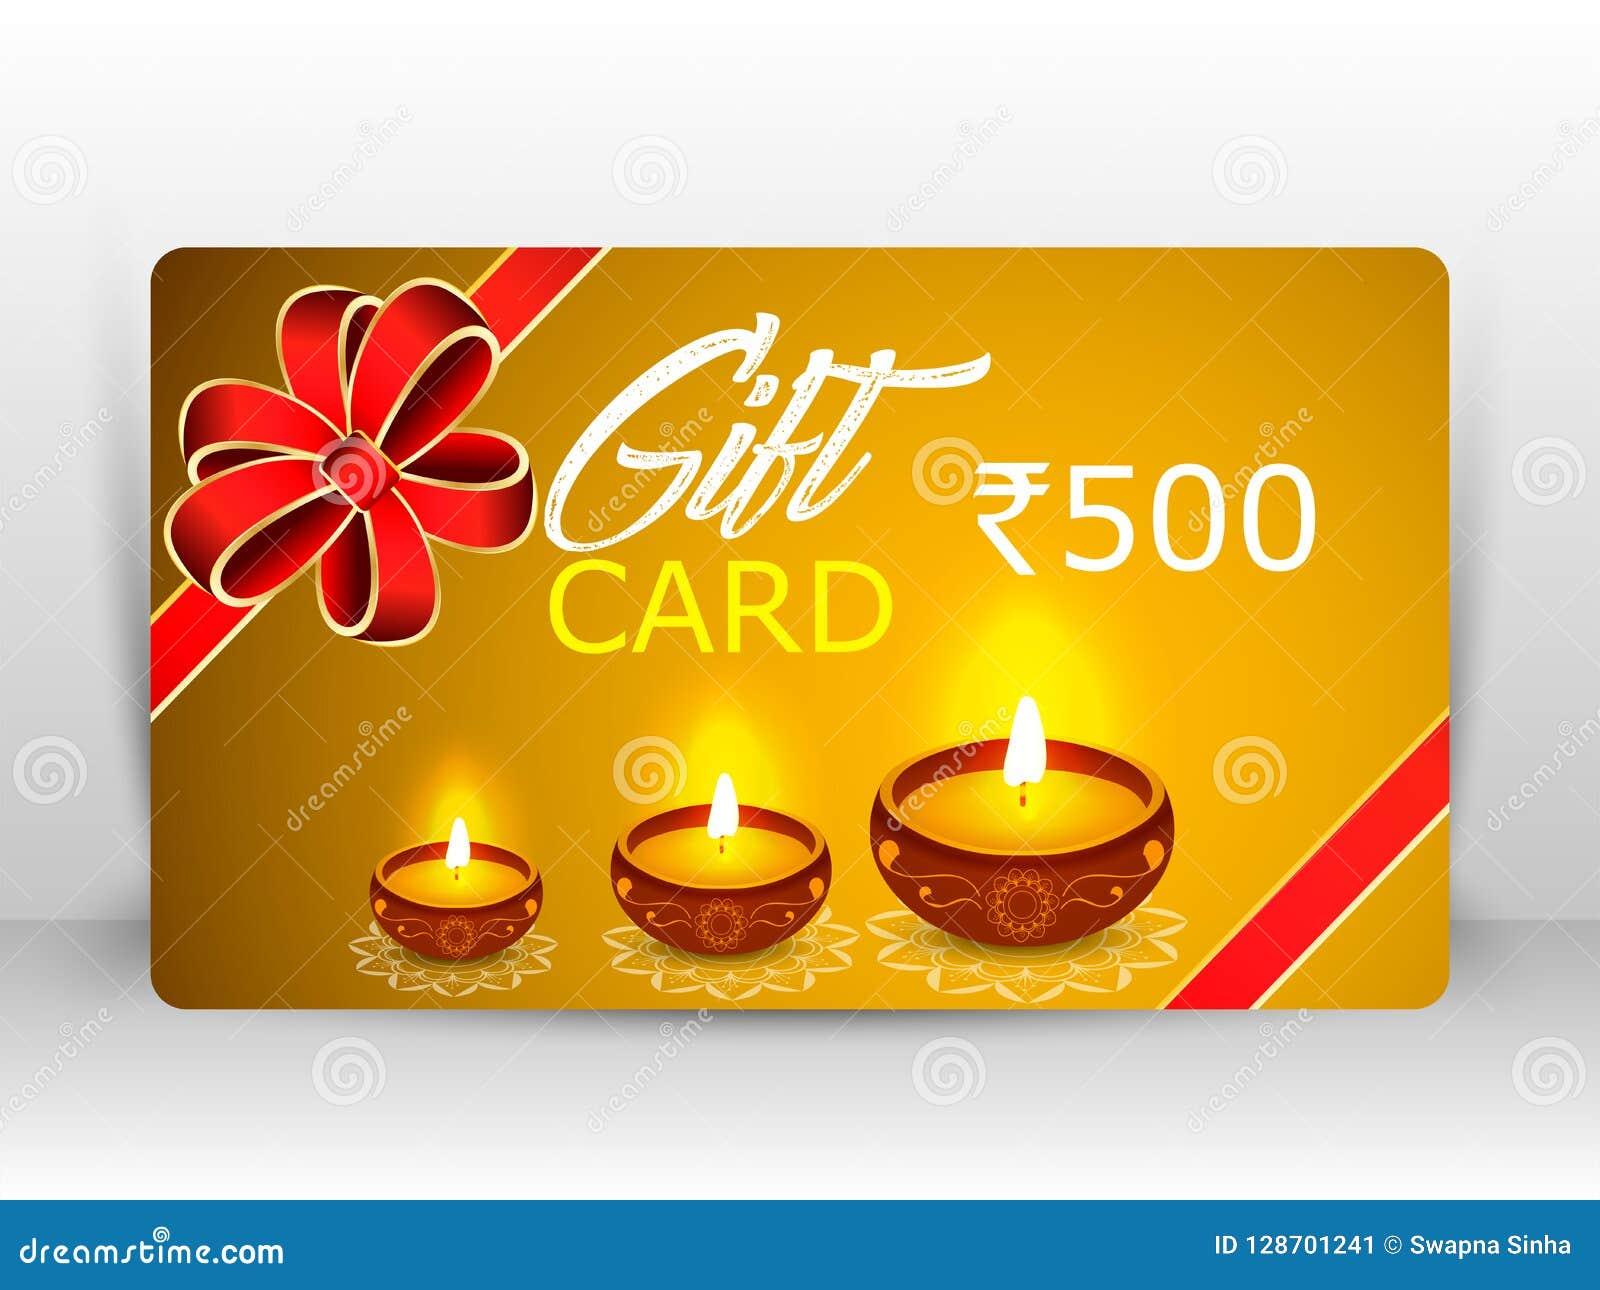 Creative illustration of burning diya with fireworks, diwali gift card